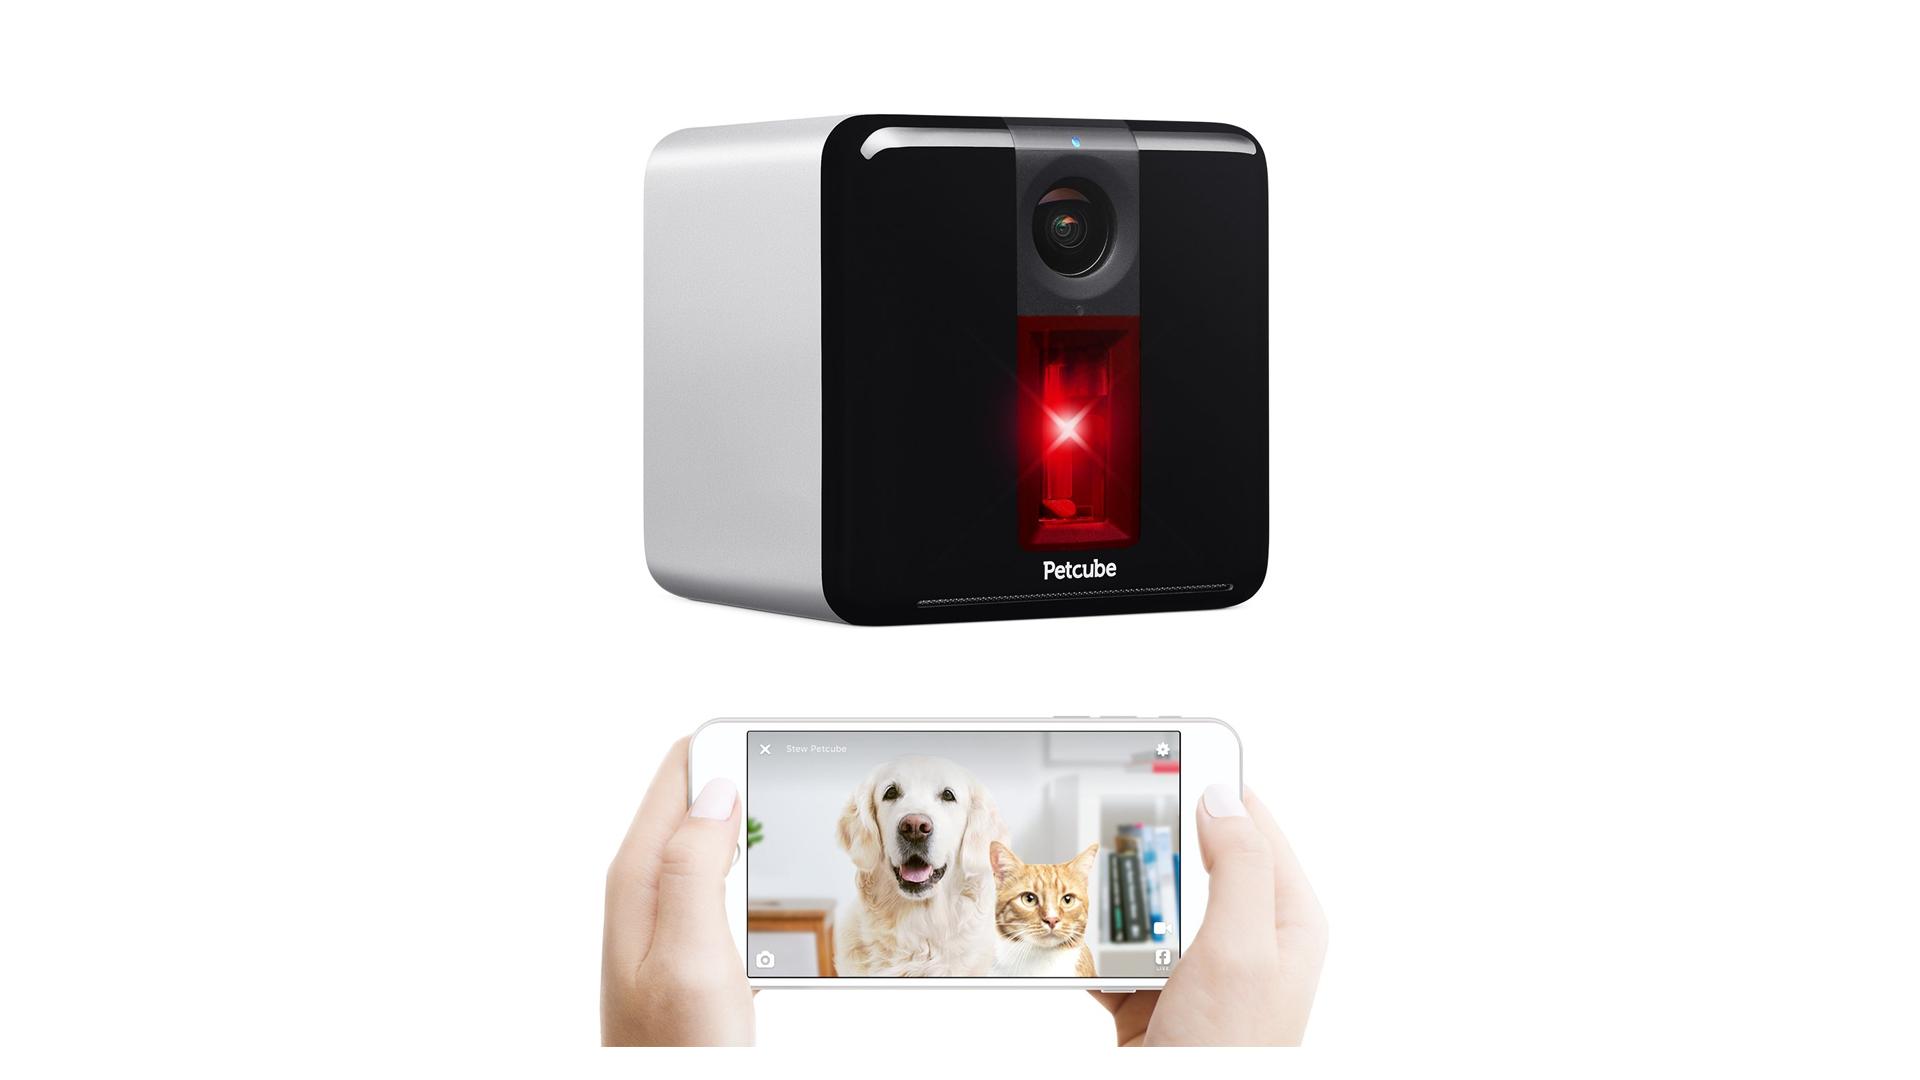 The Petcube smart camera.